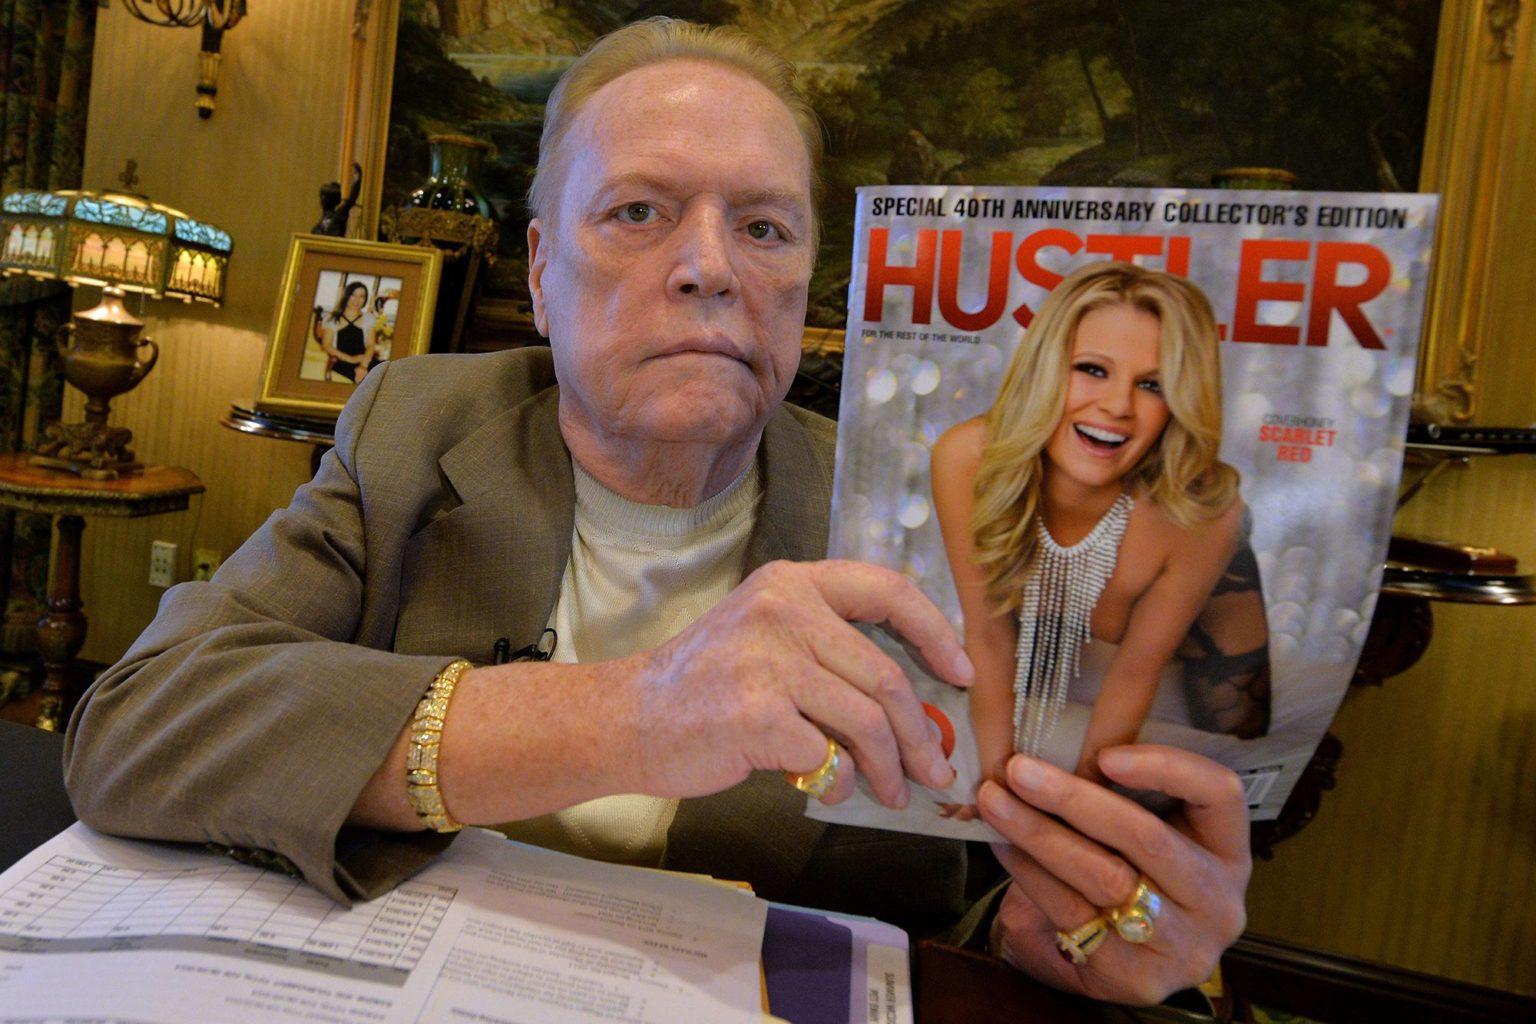 Умер владелец порножурнала Hustler Ларри Флинт